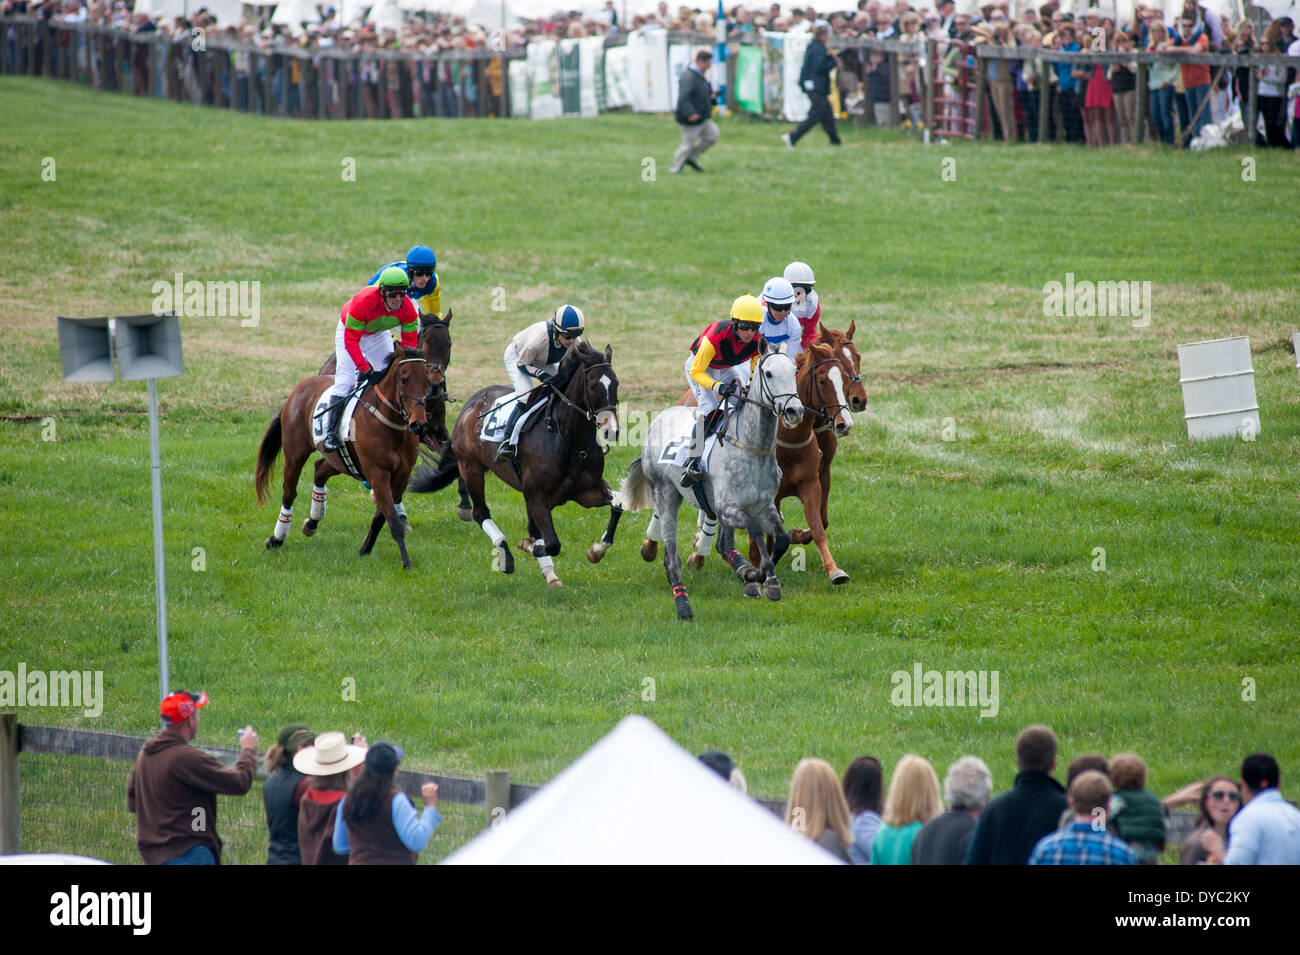 Manor Races steeple chase race, Maryland - Stock Image